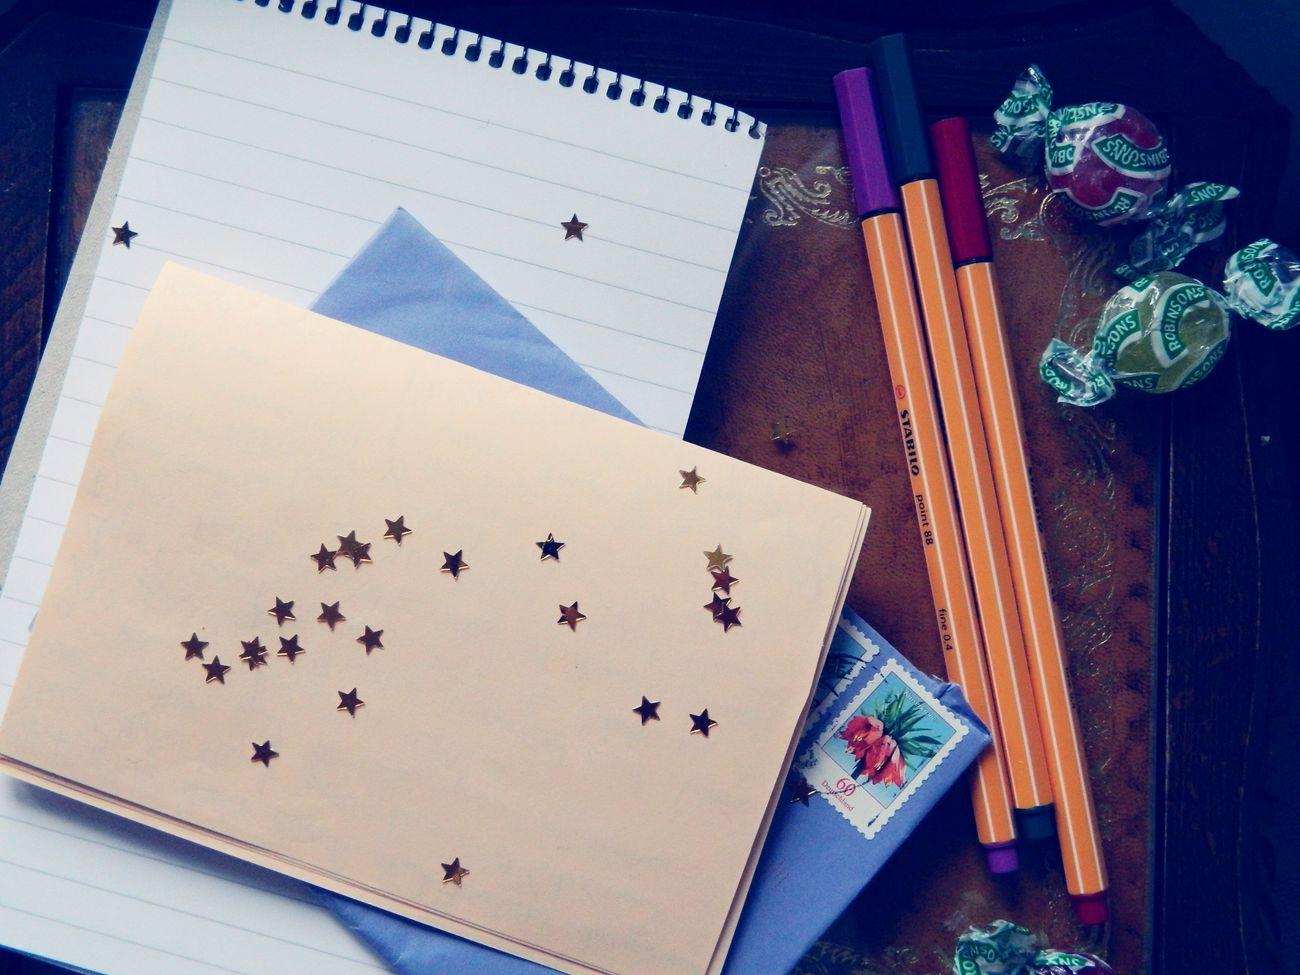 Penpals Letters Stars Writing ?